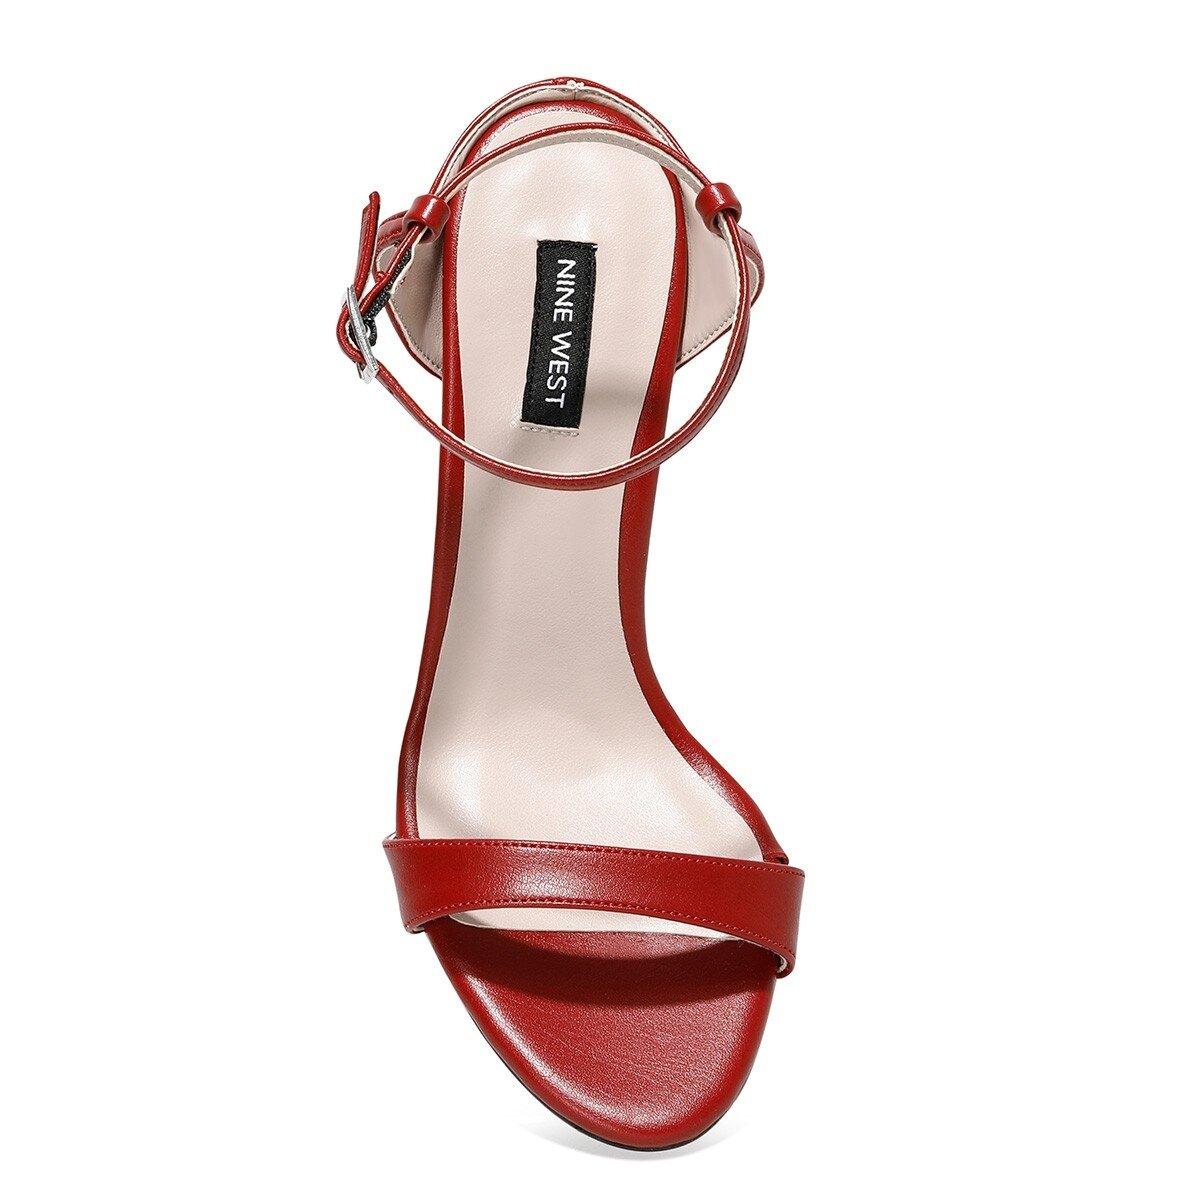 HELLEMA 1FX Kırmızı Kadın Topuklu Sandalet